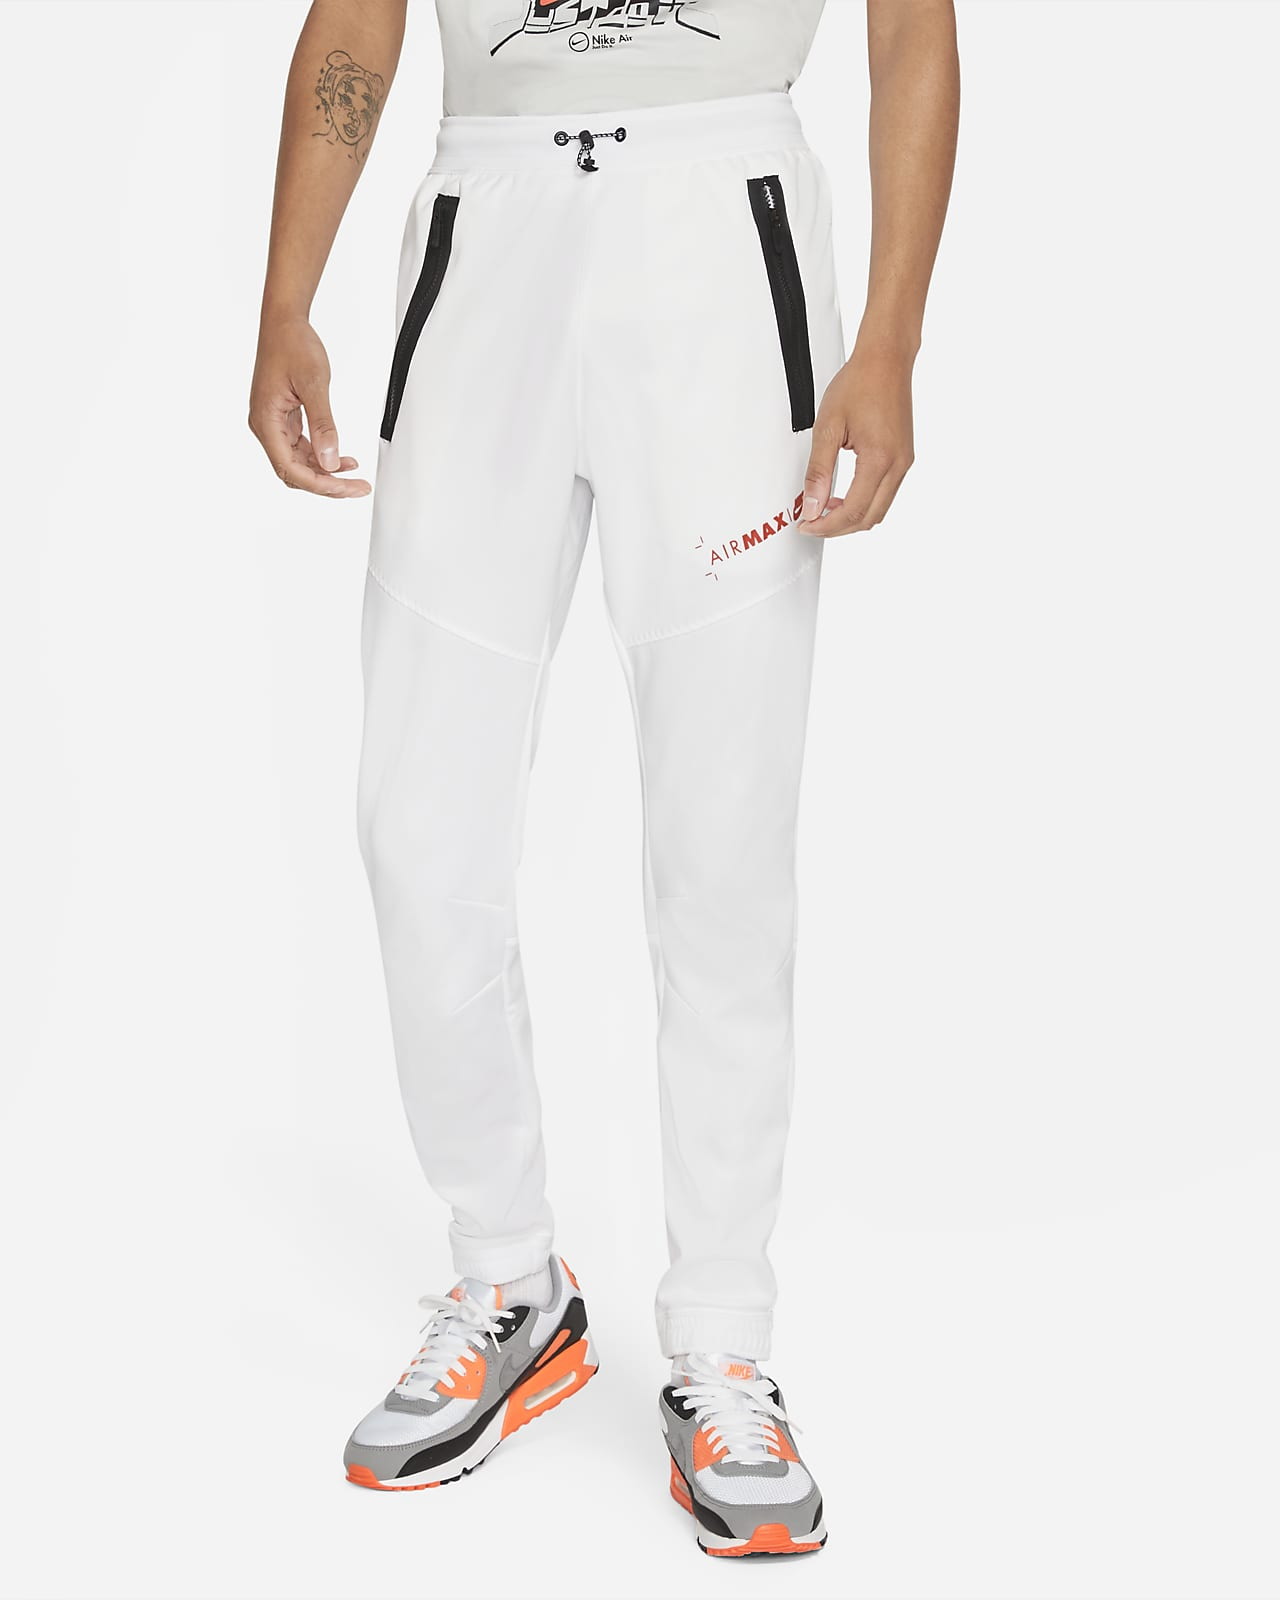 Pantalones de tejido Fleece para hombre Nike Sportswear Air Max